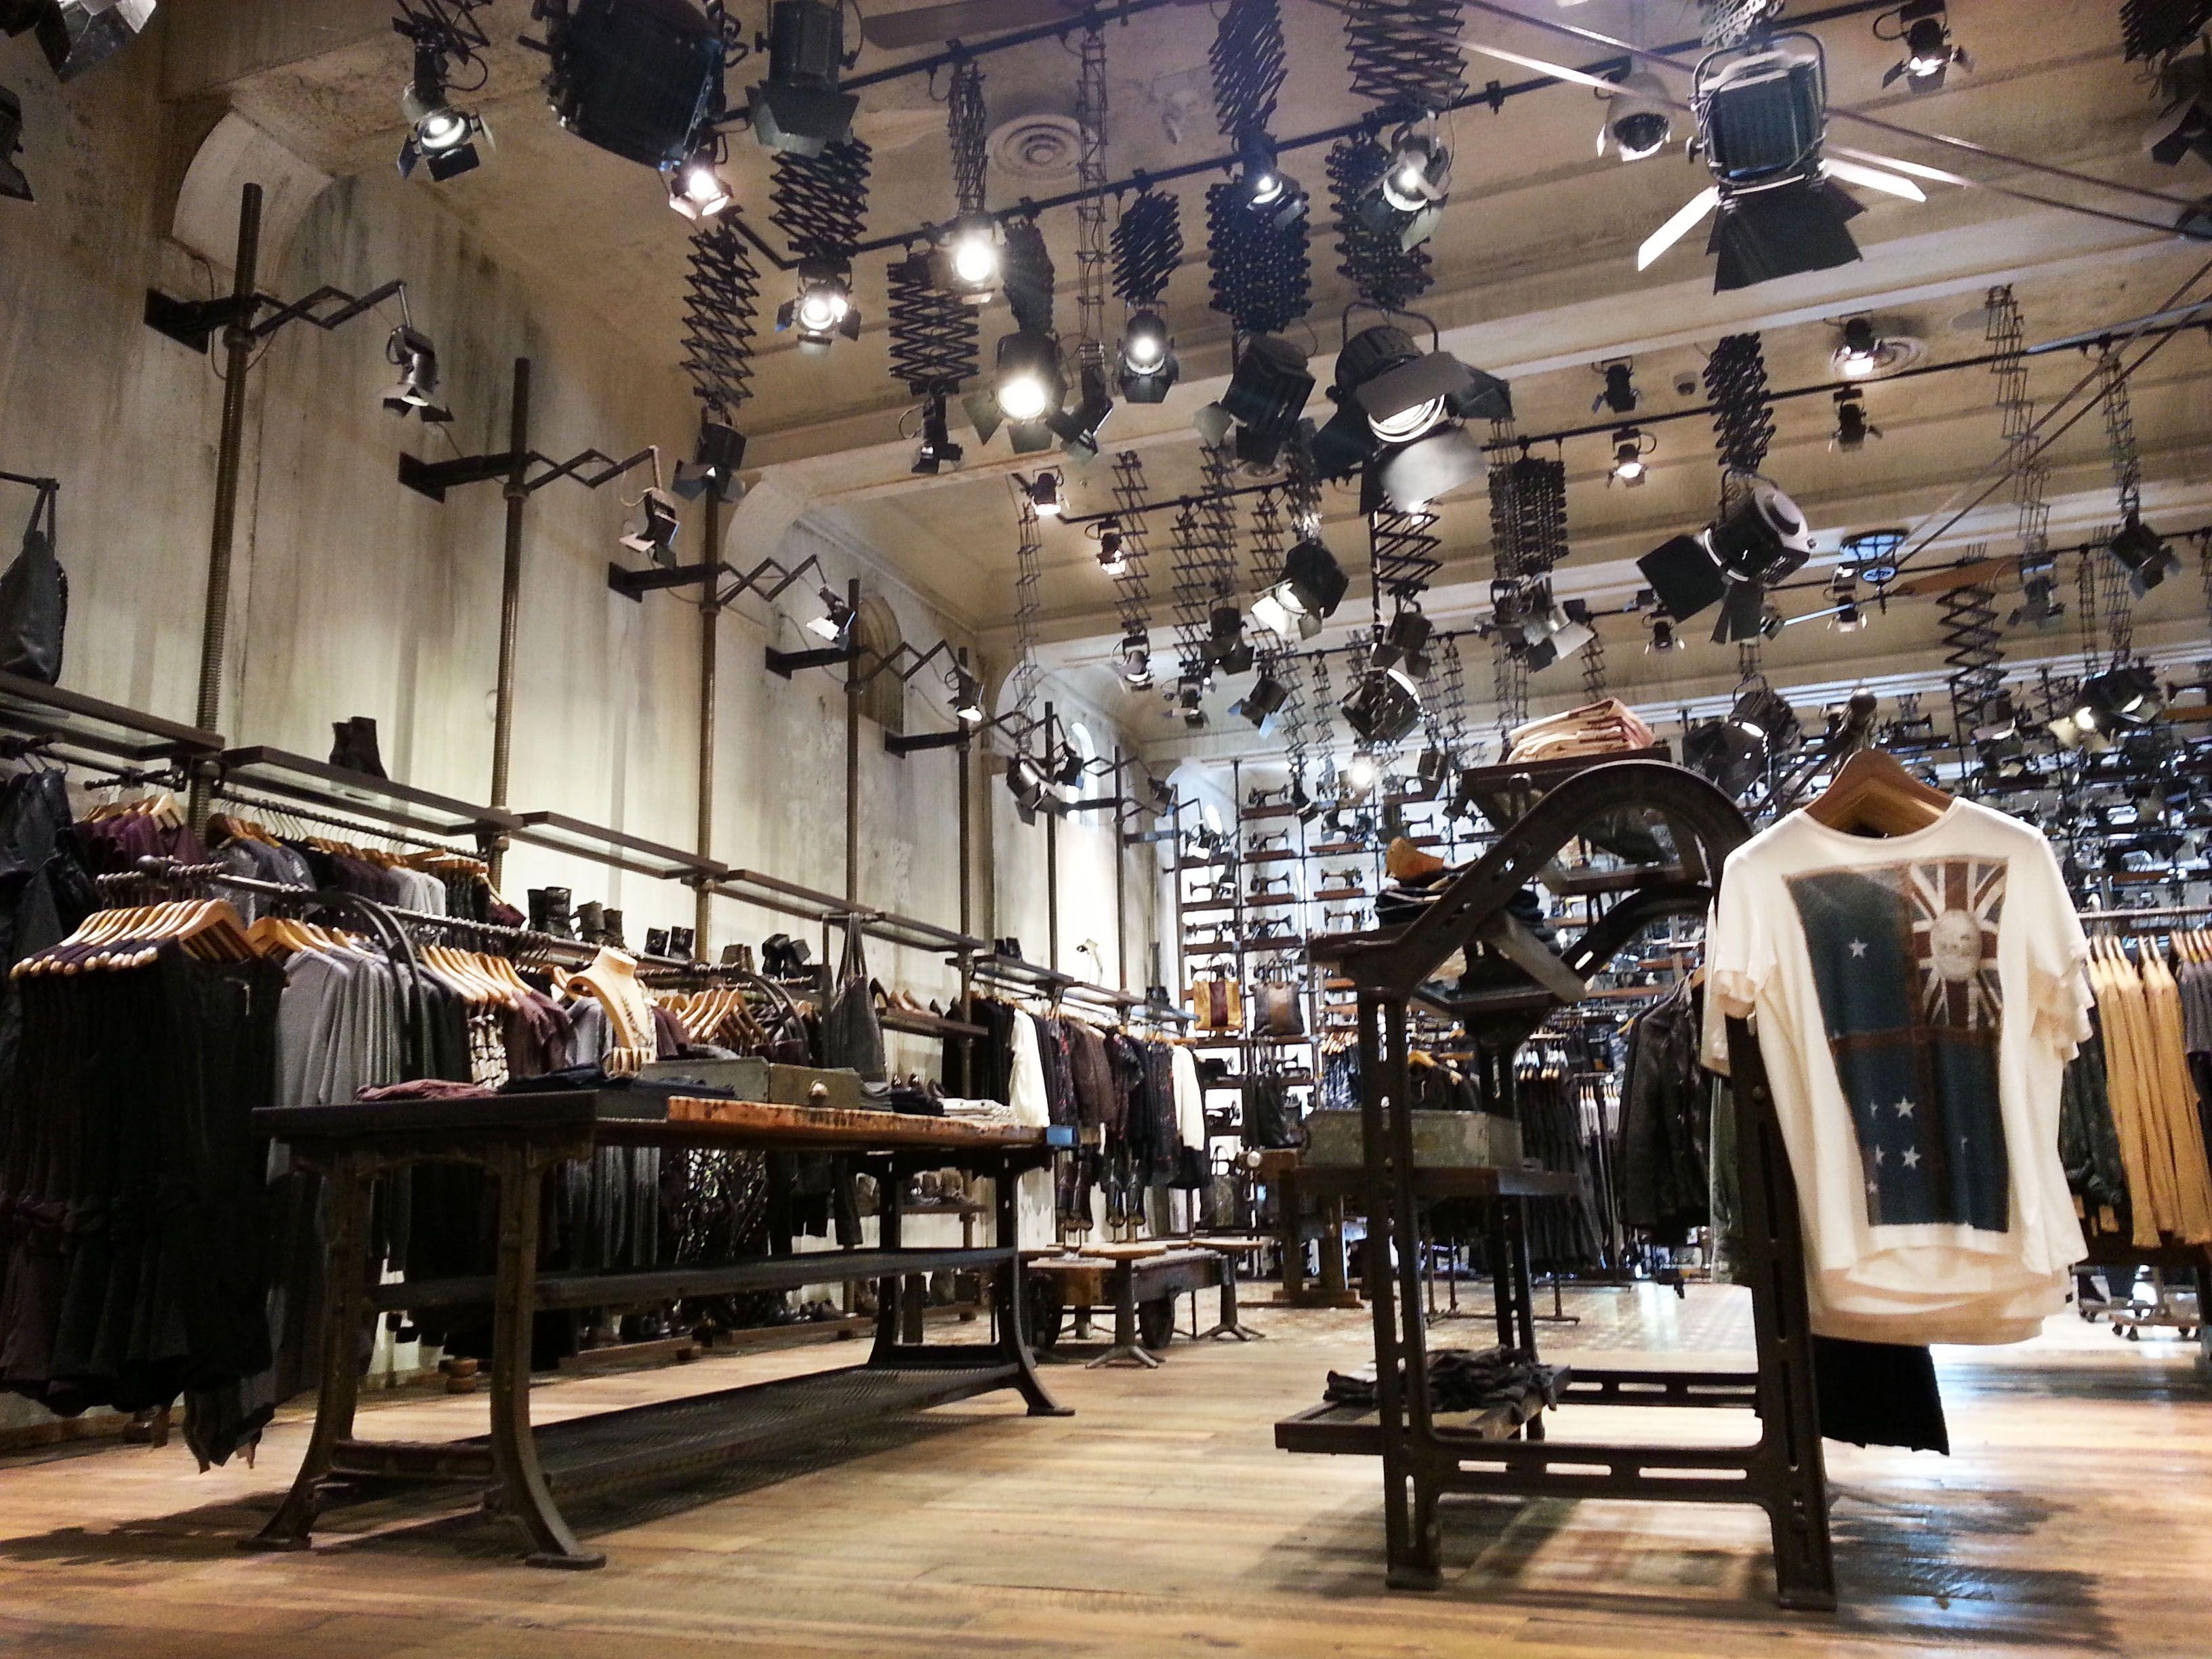 All saints retail environment